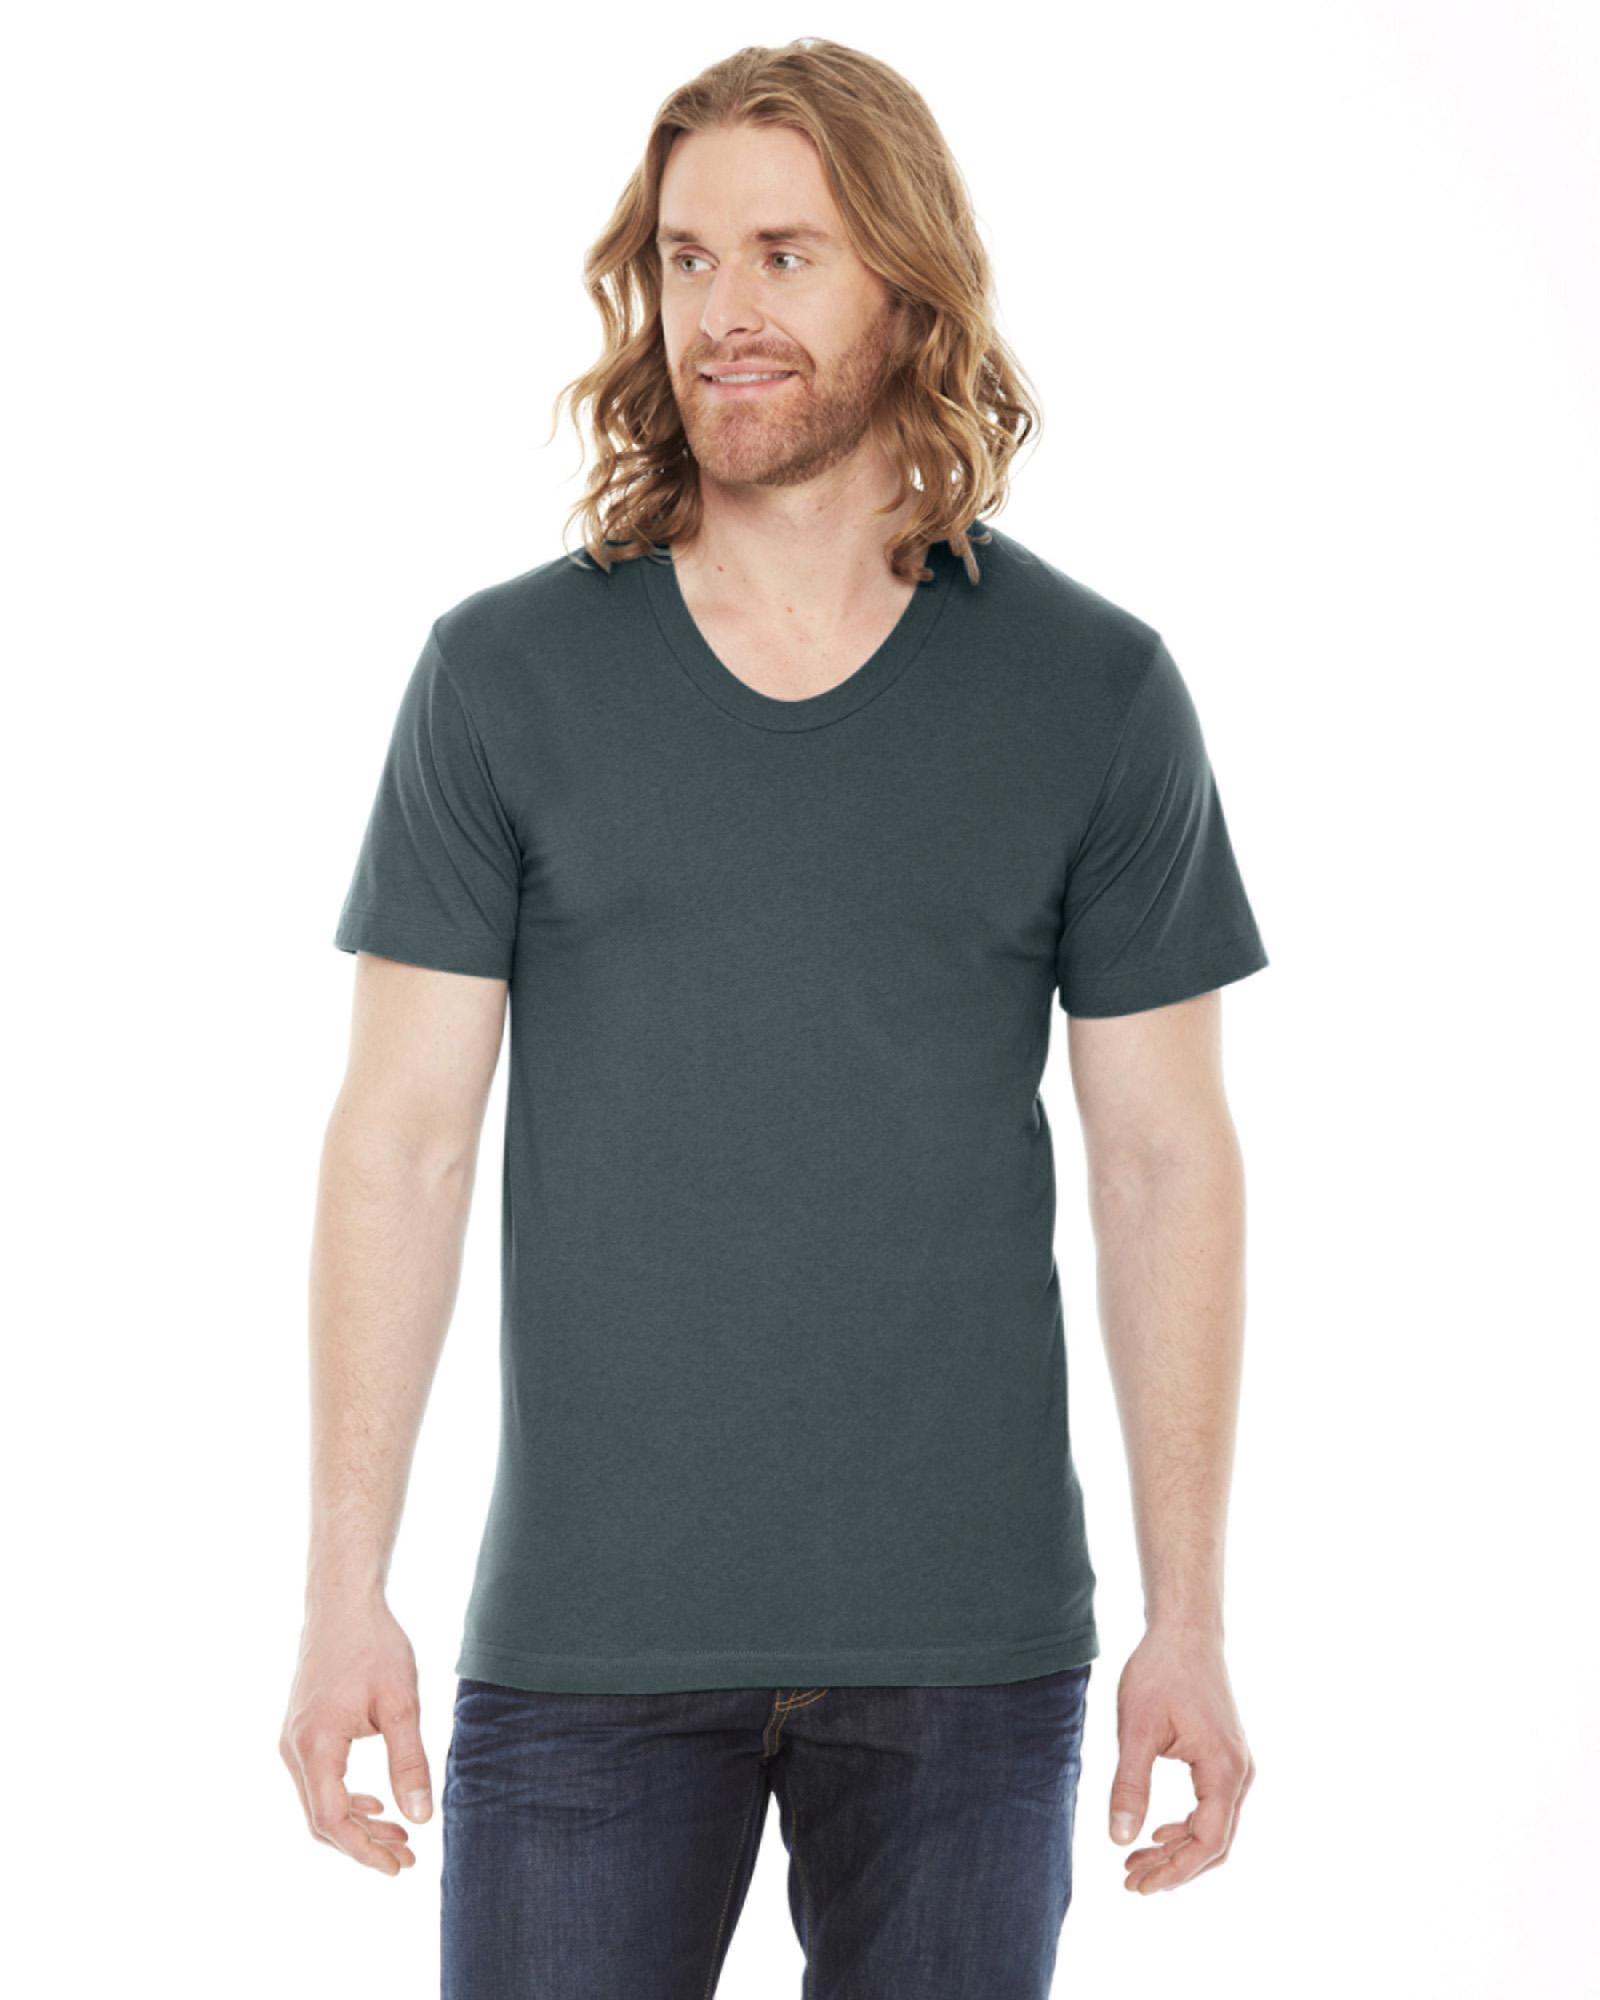 American apparel rsa6402 unisex sheer jersey loose crew for American apparel mesh shirt